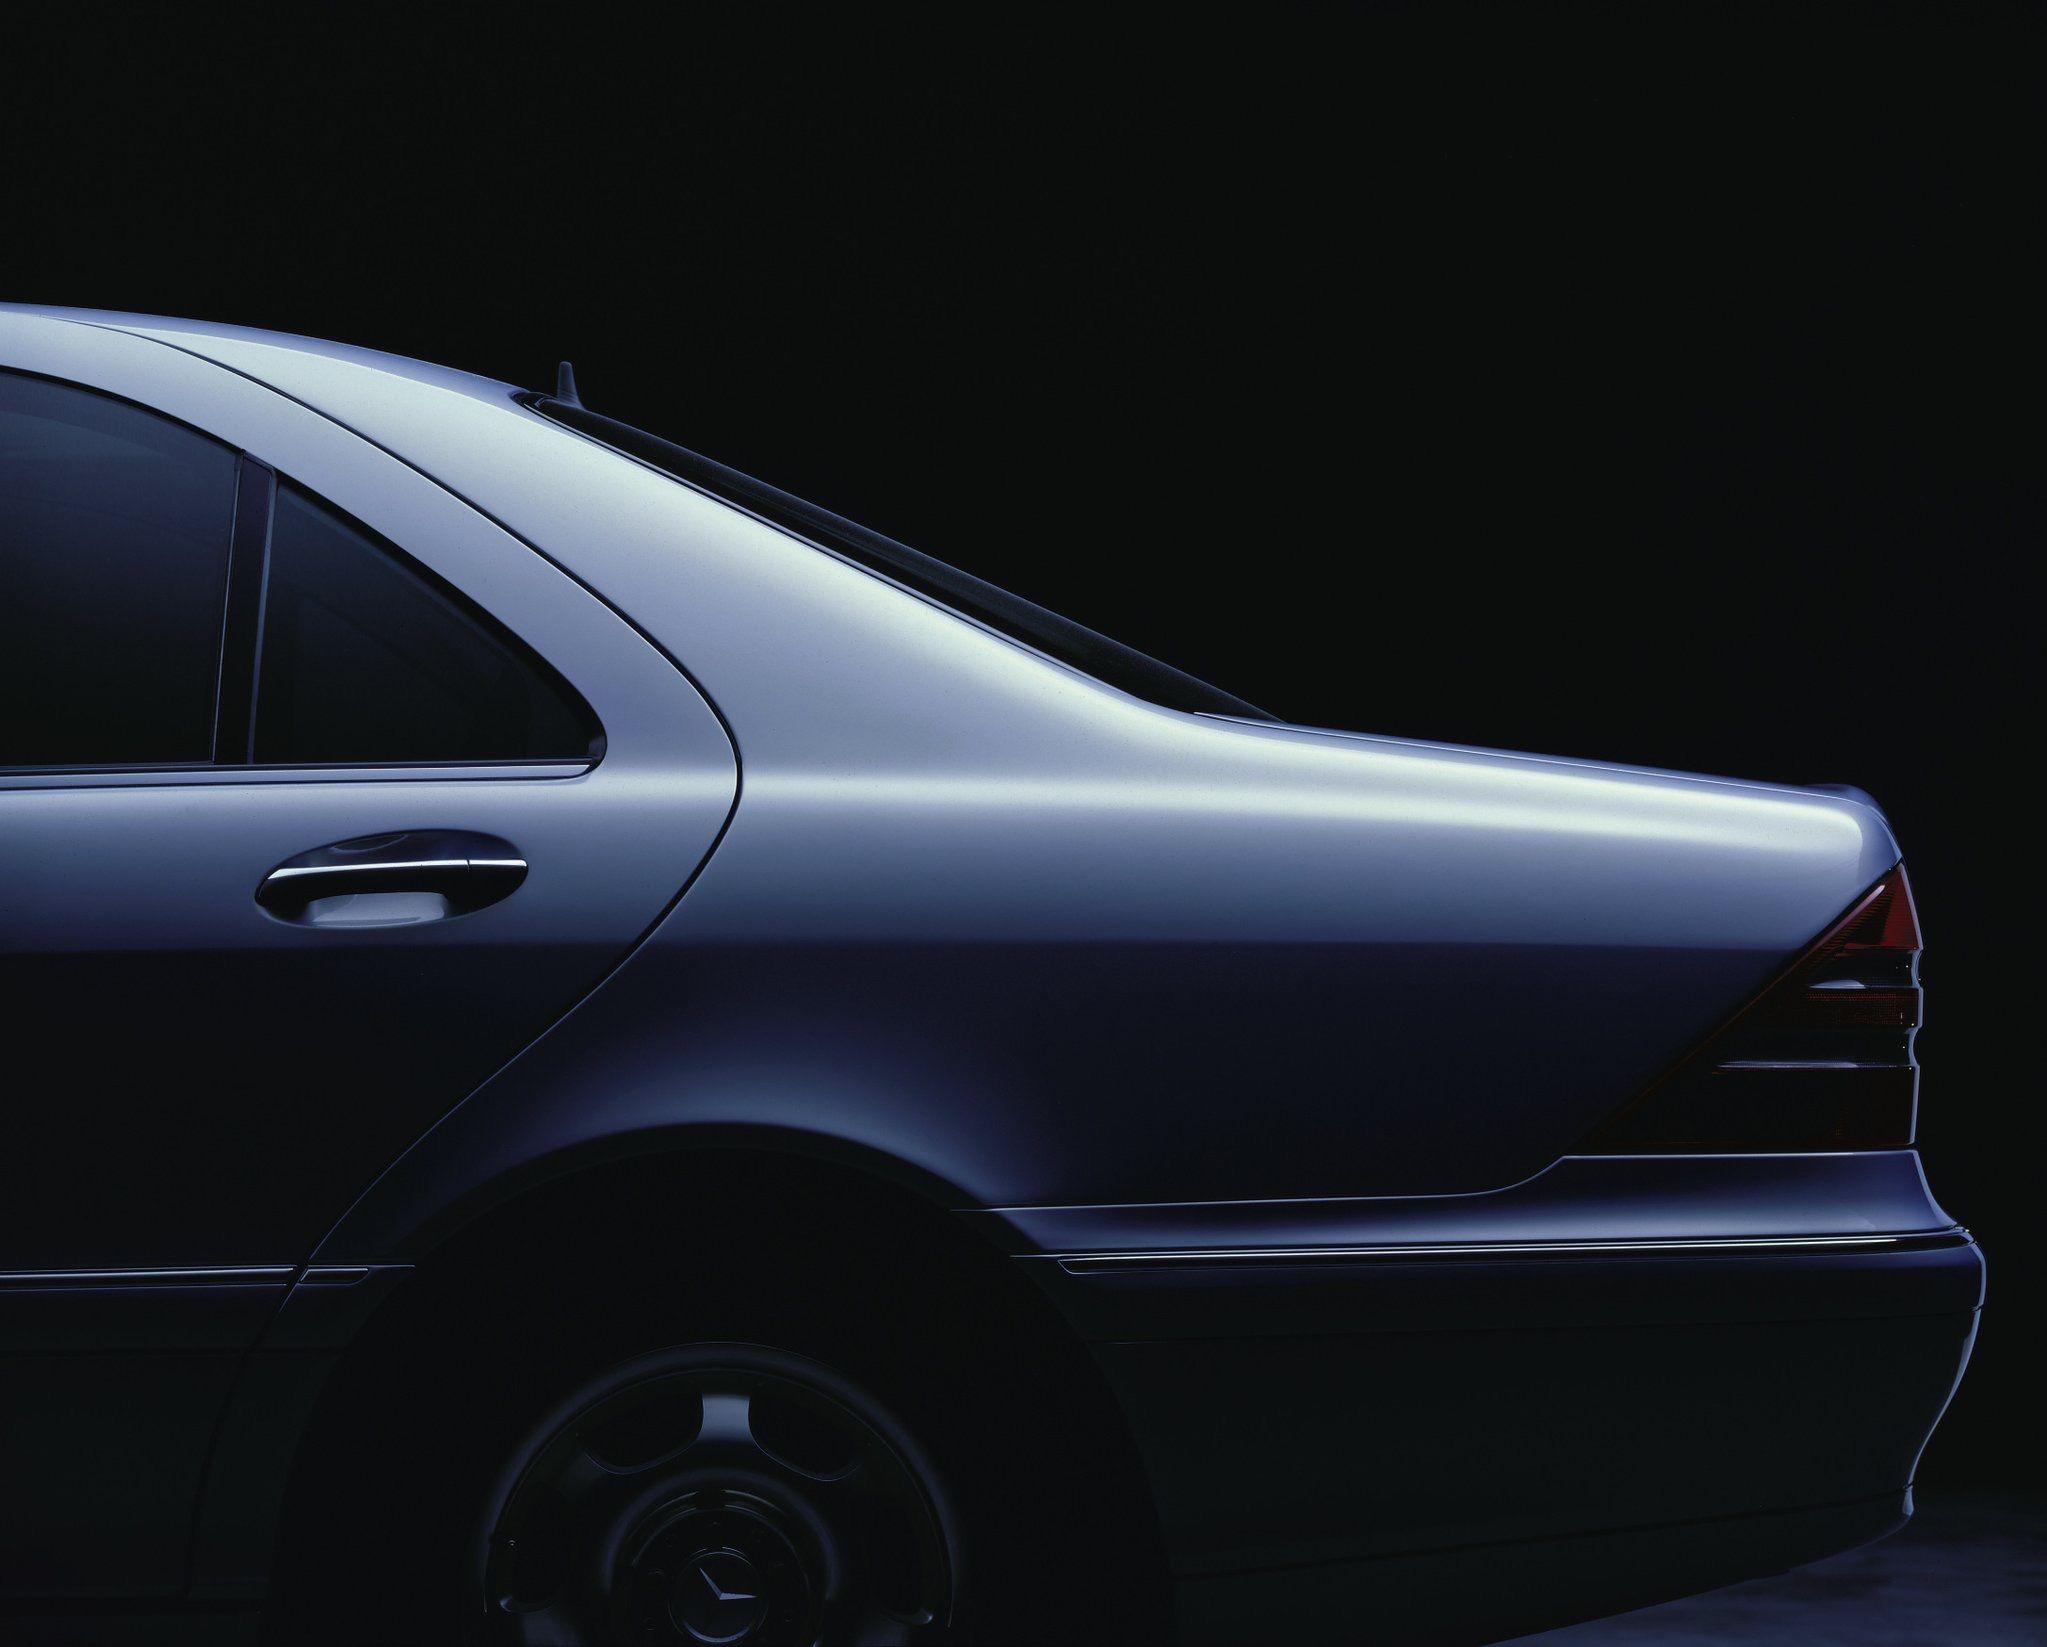 Mercedes Benz S Klasse W220